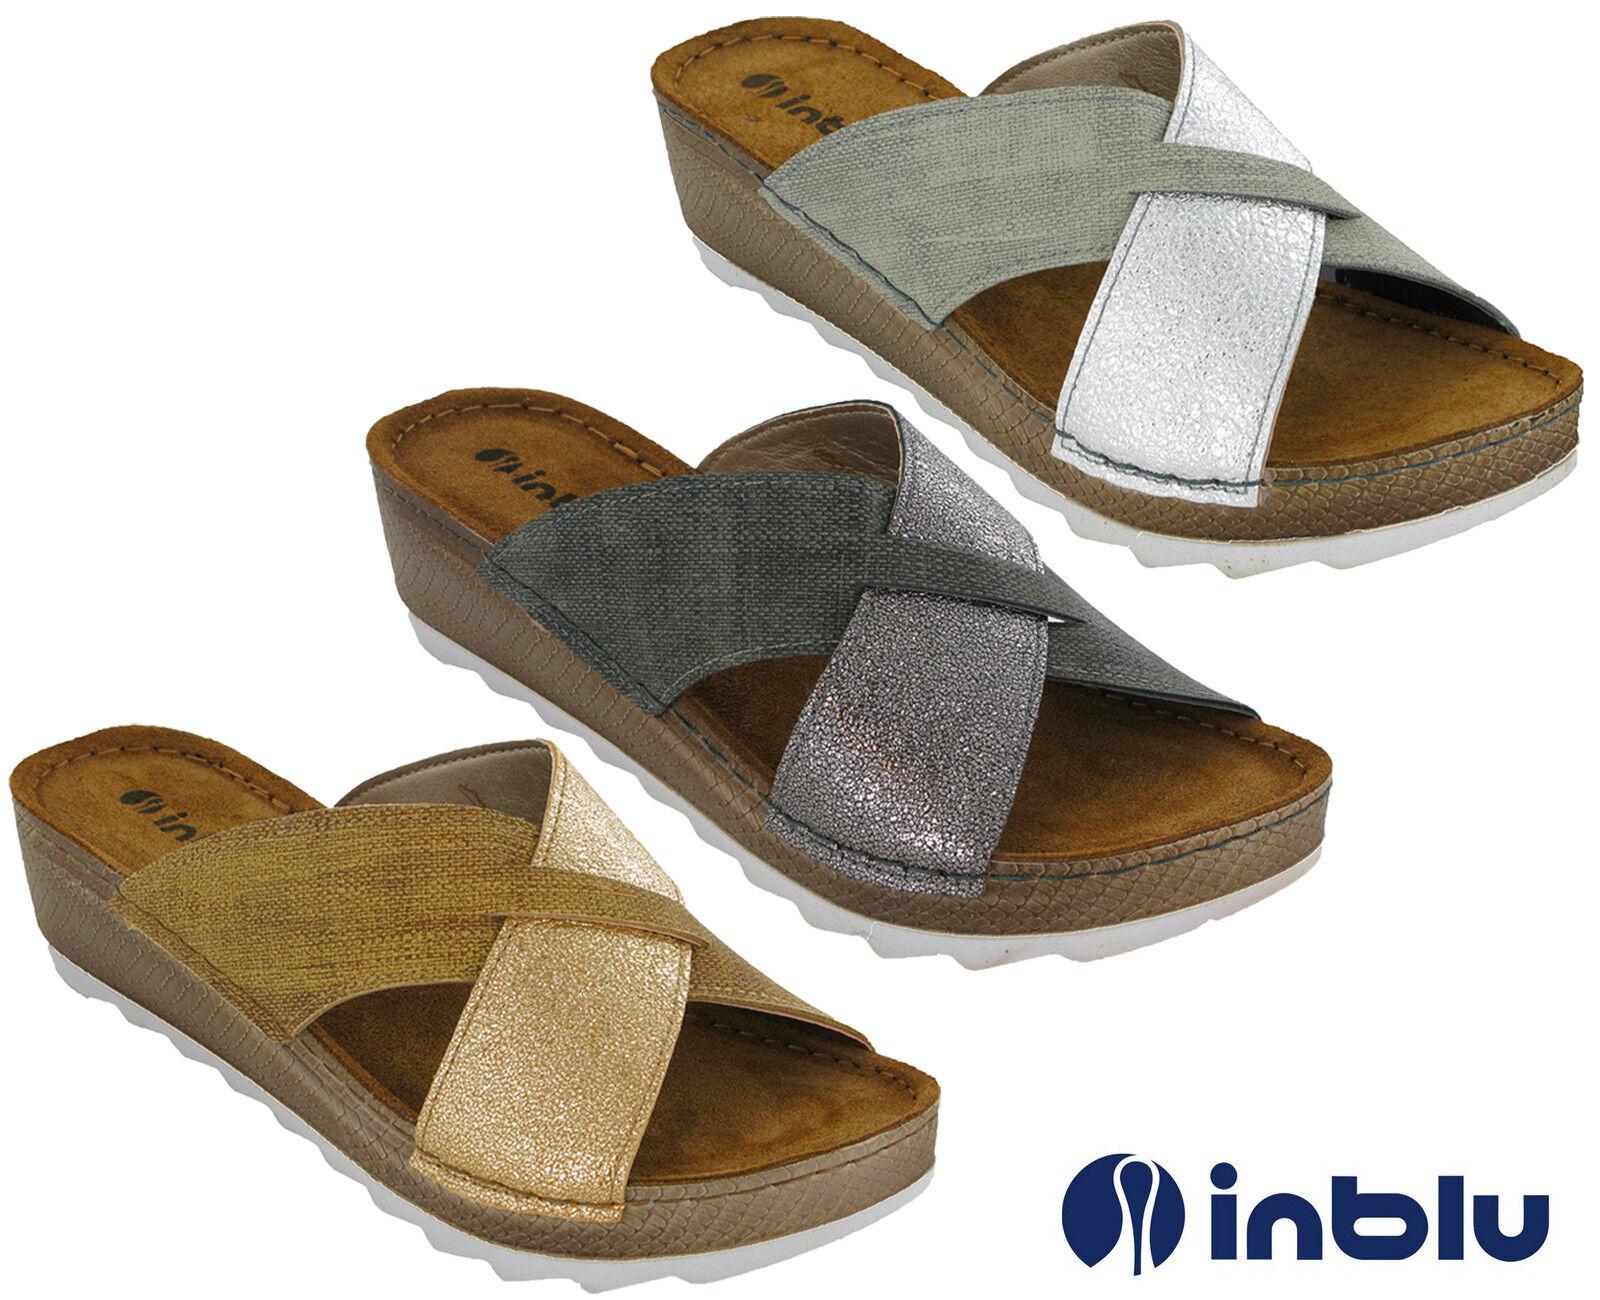 Inblu Slip On Wedge Sandals Padded